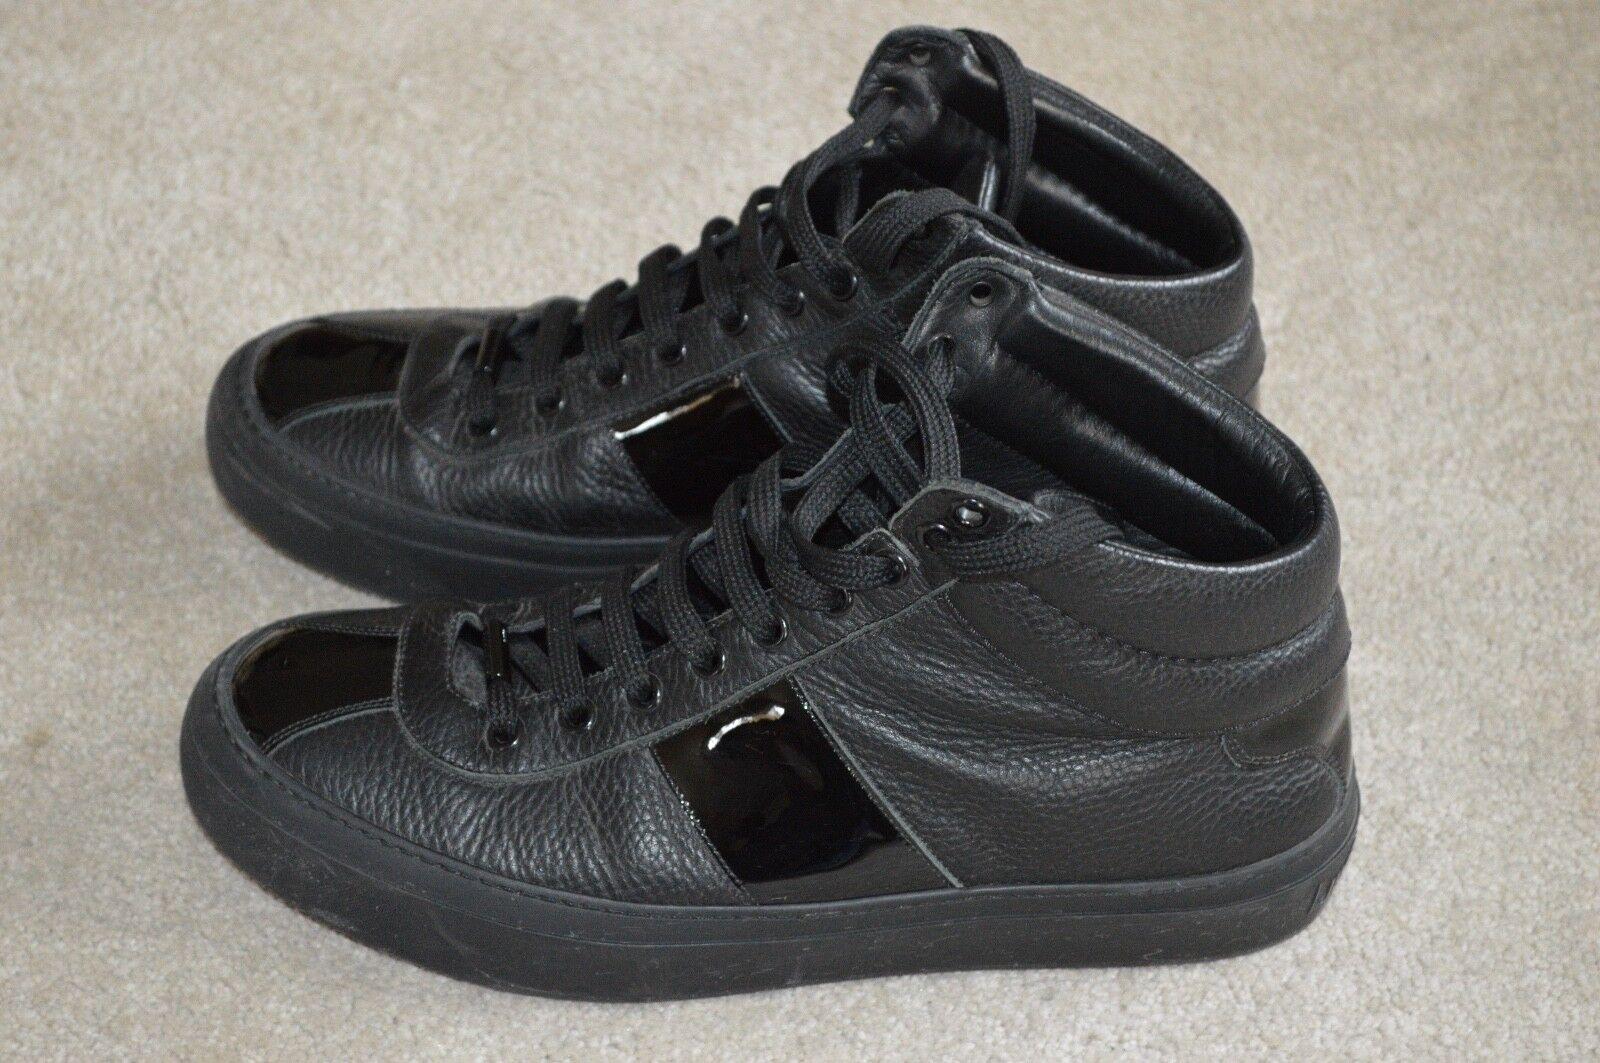 Jimmy Choo Black Belgravia Leather Sneakers Hi Top Trainers Mens UK 7.5 EU 41.5